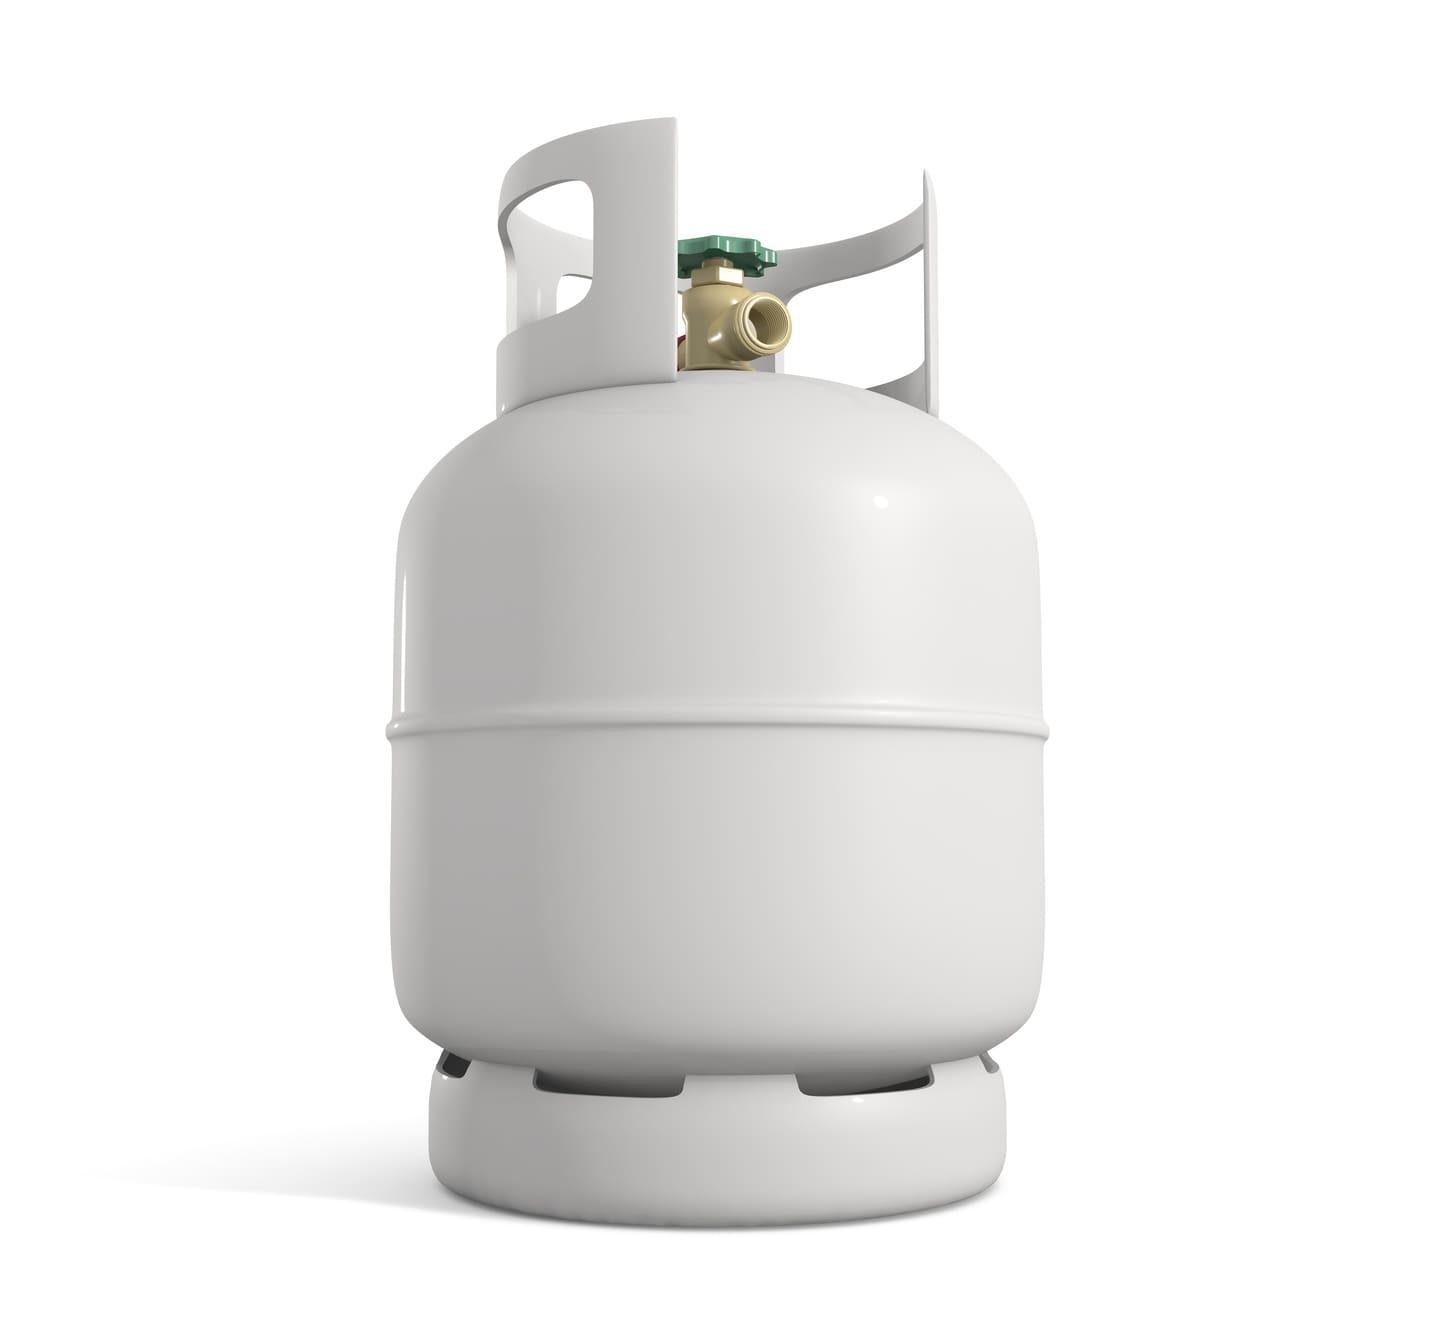 eksploatacja butli z gazem